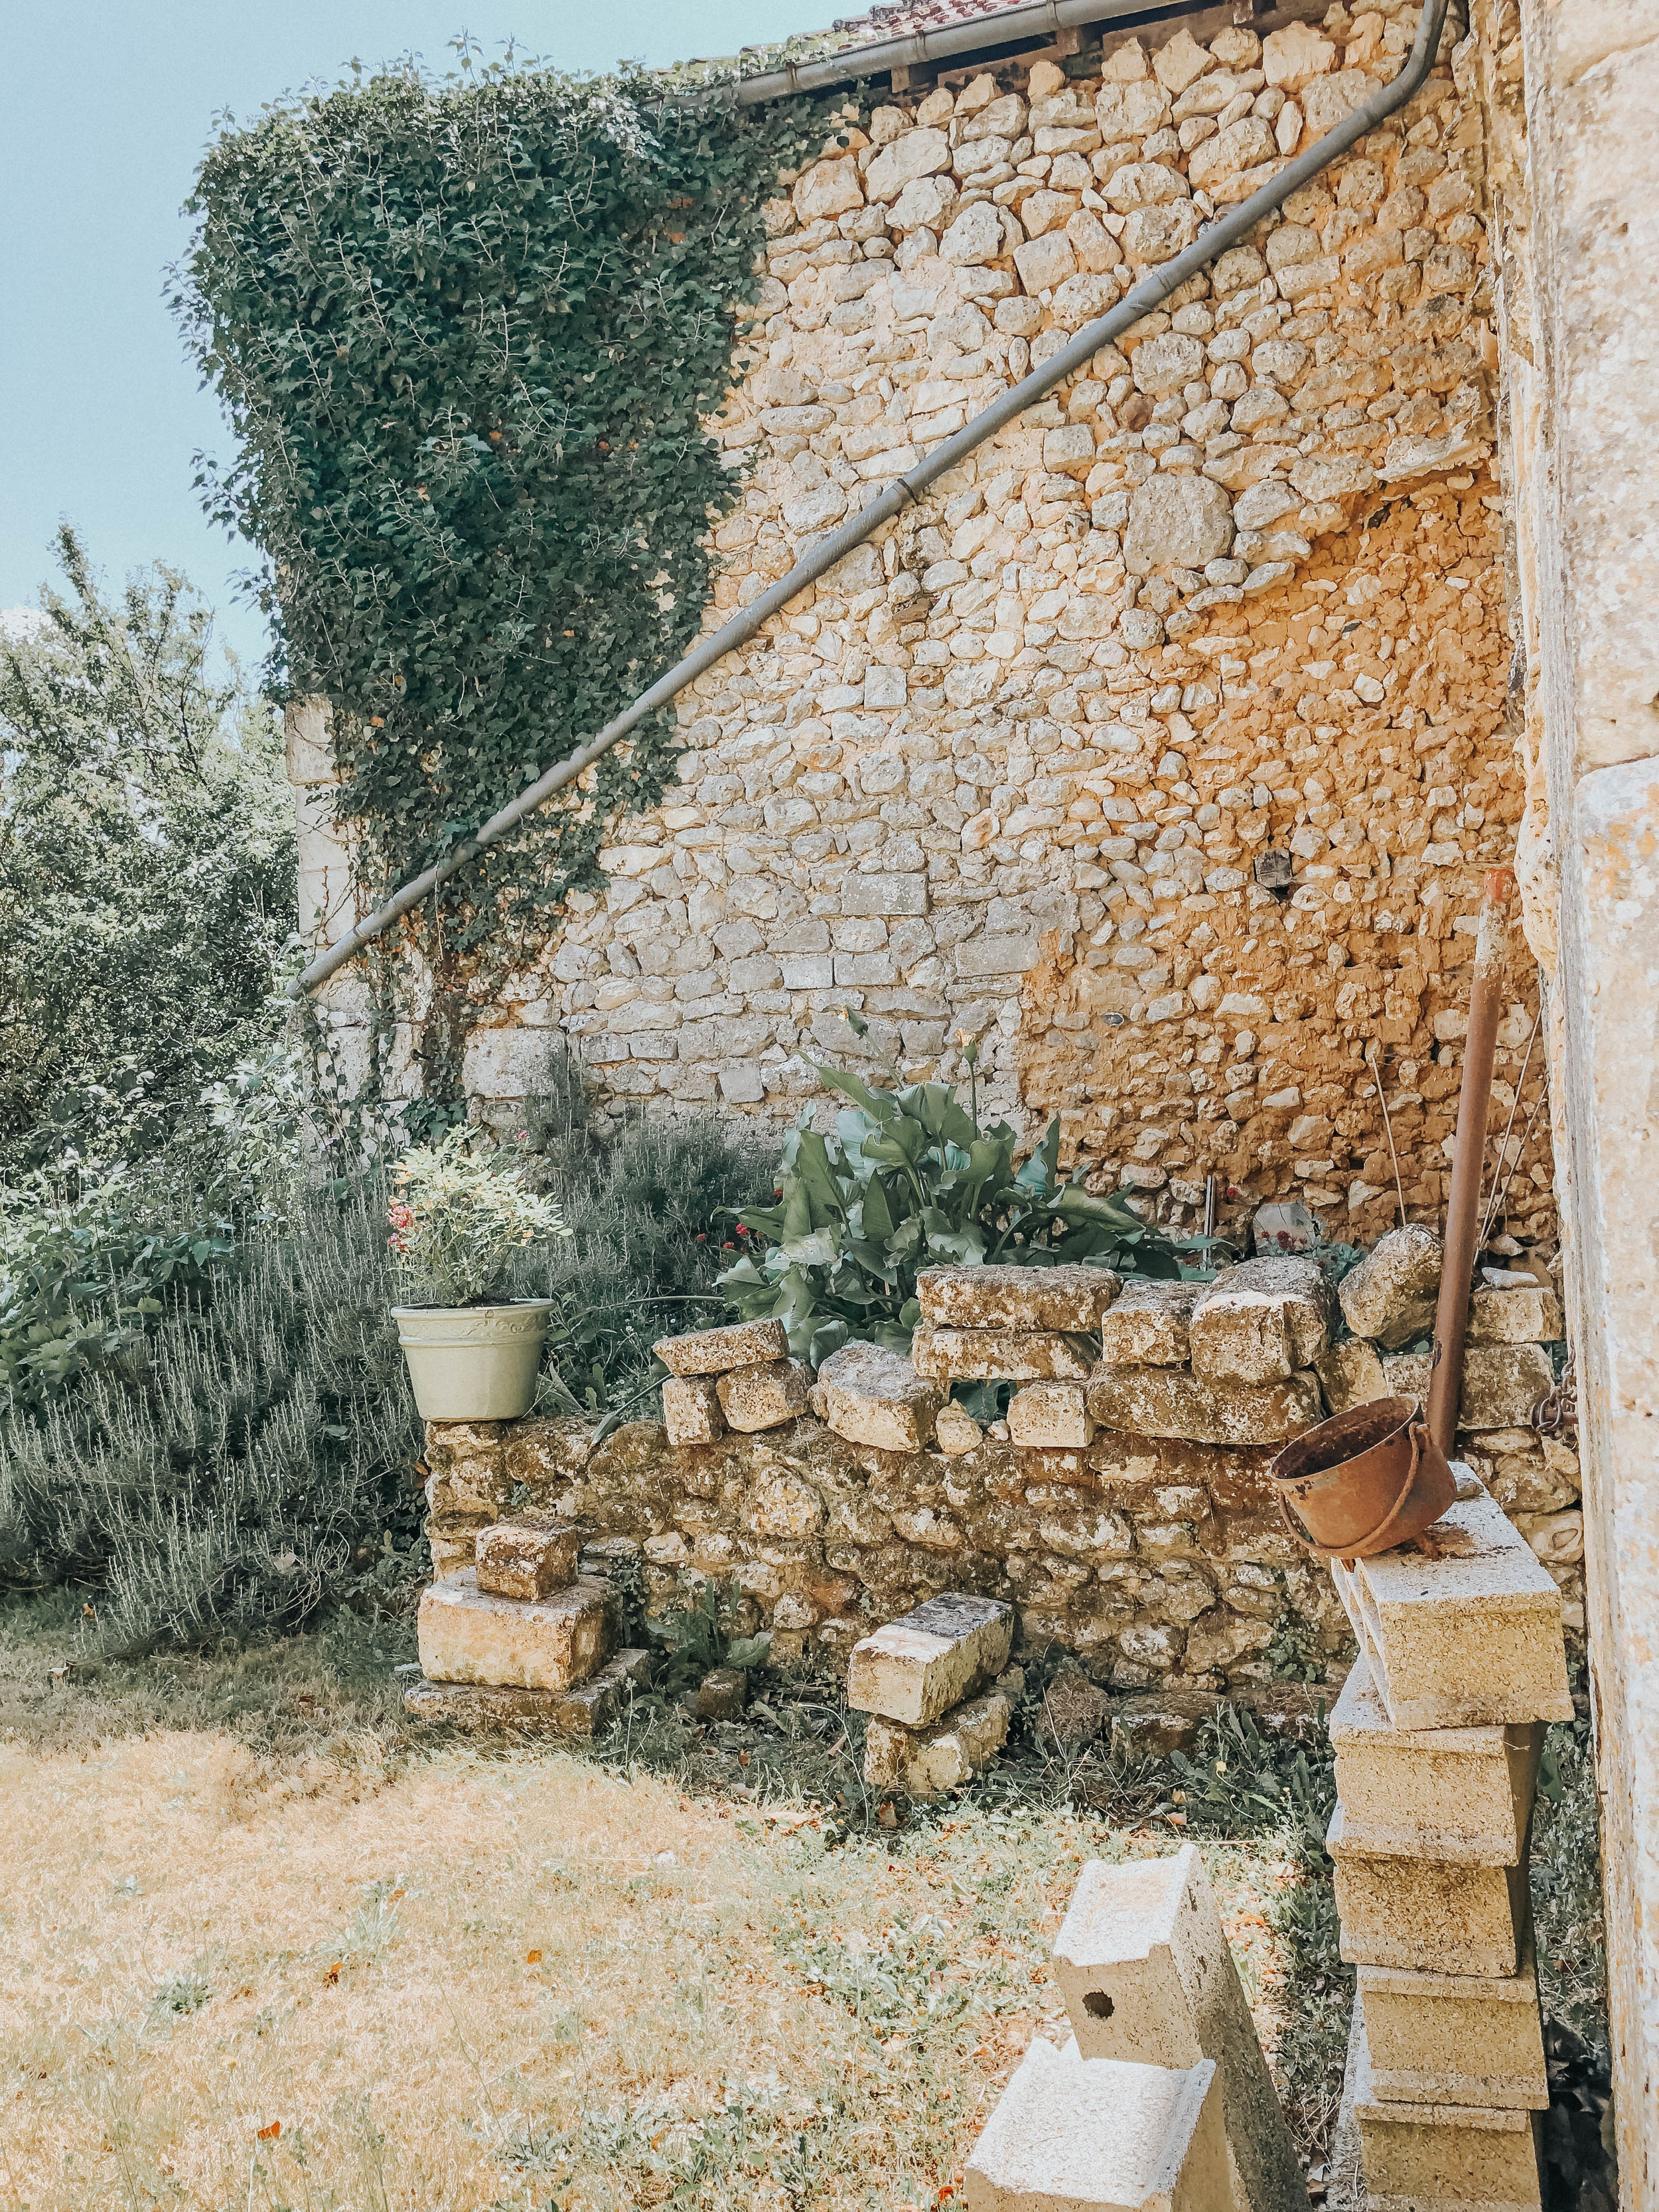 Herb Garden | Truffières, France